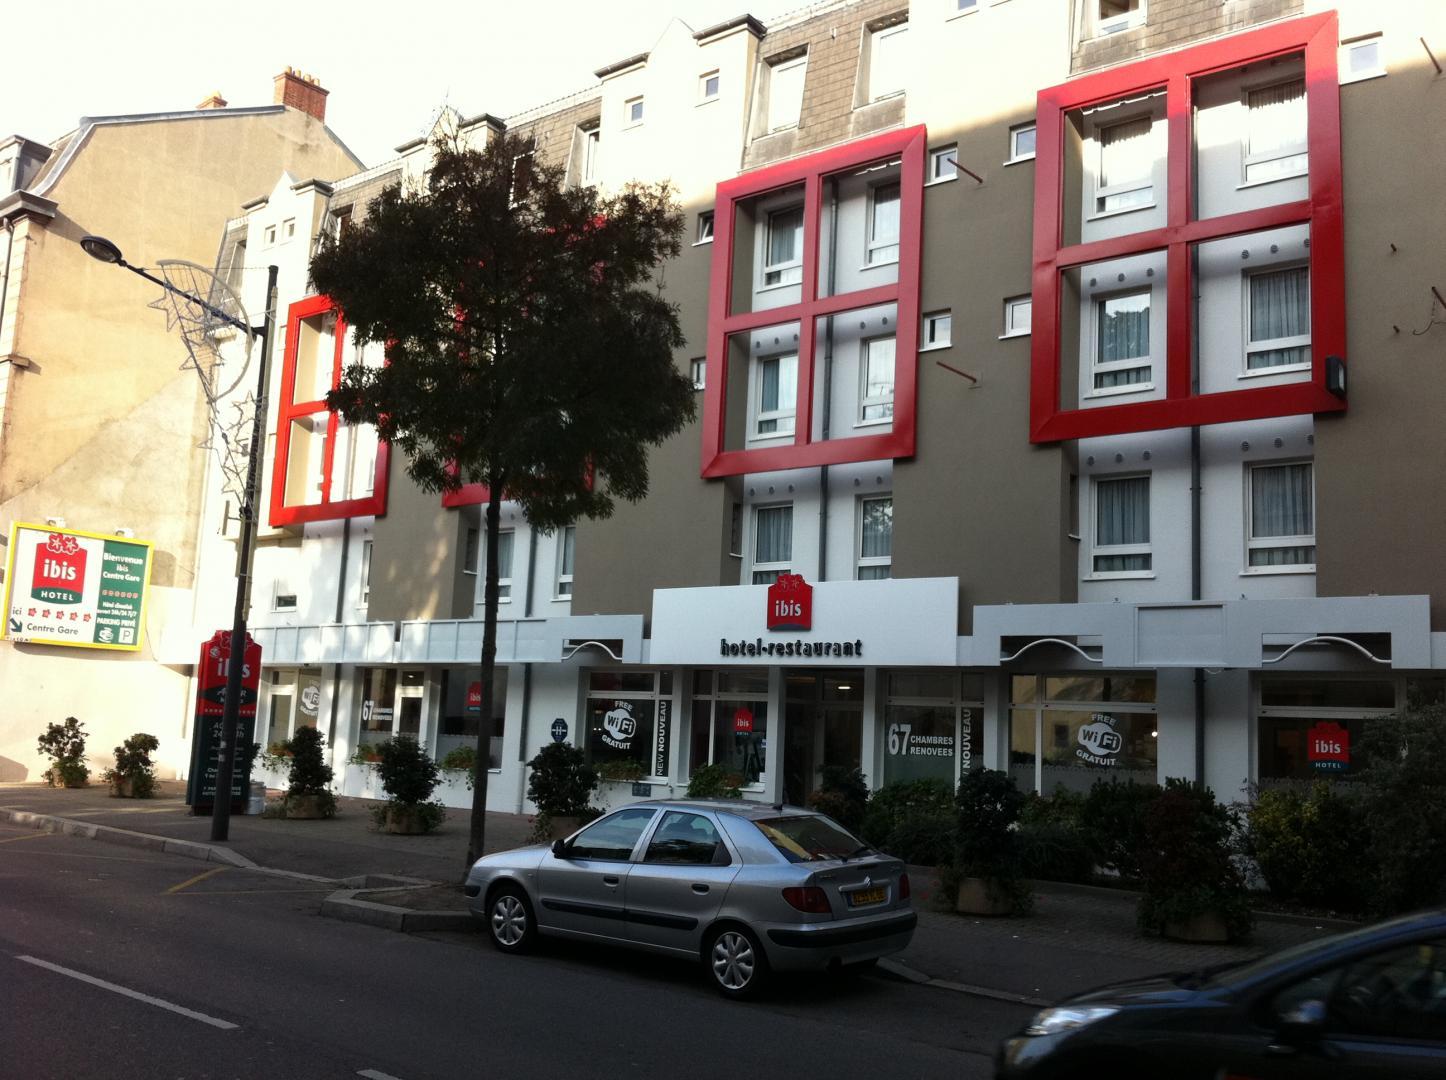 s minaire mulhouse h tel ibis mulhouse centre gare alsameeting. Black Bedroom Furniture Sets. Home Design Ideas